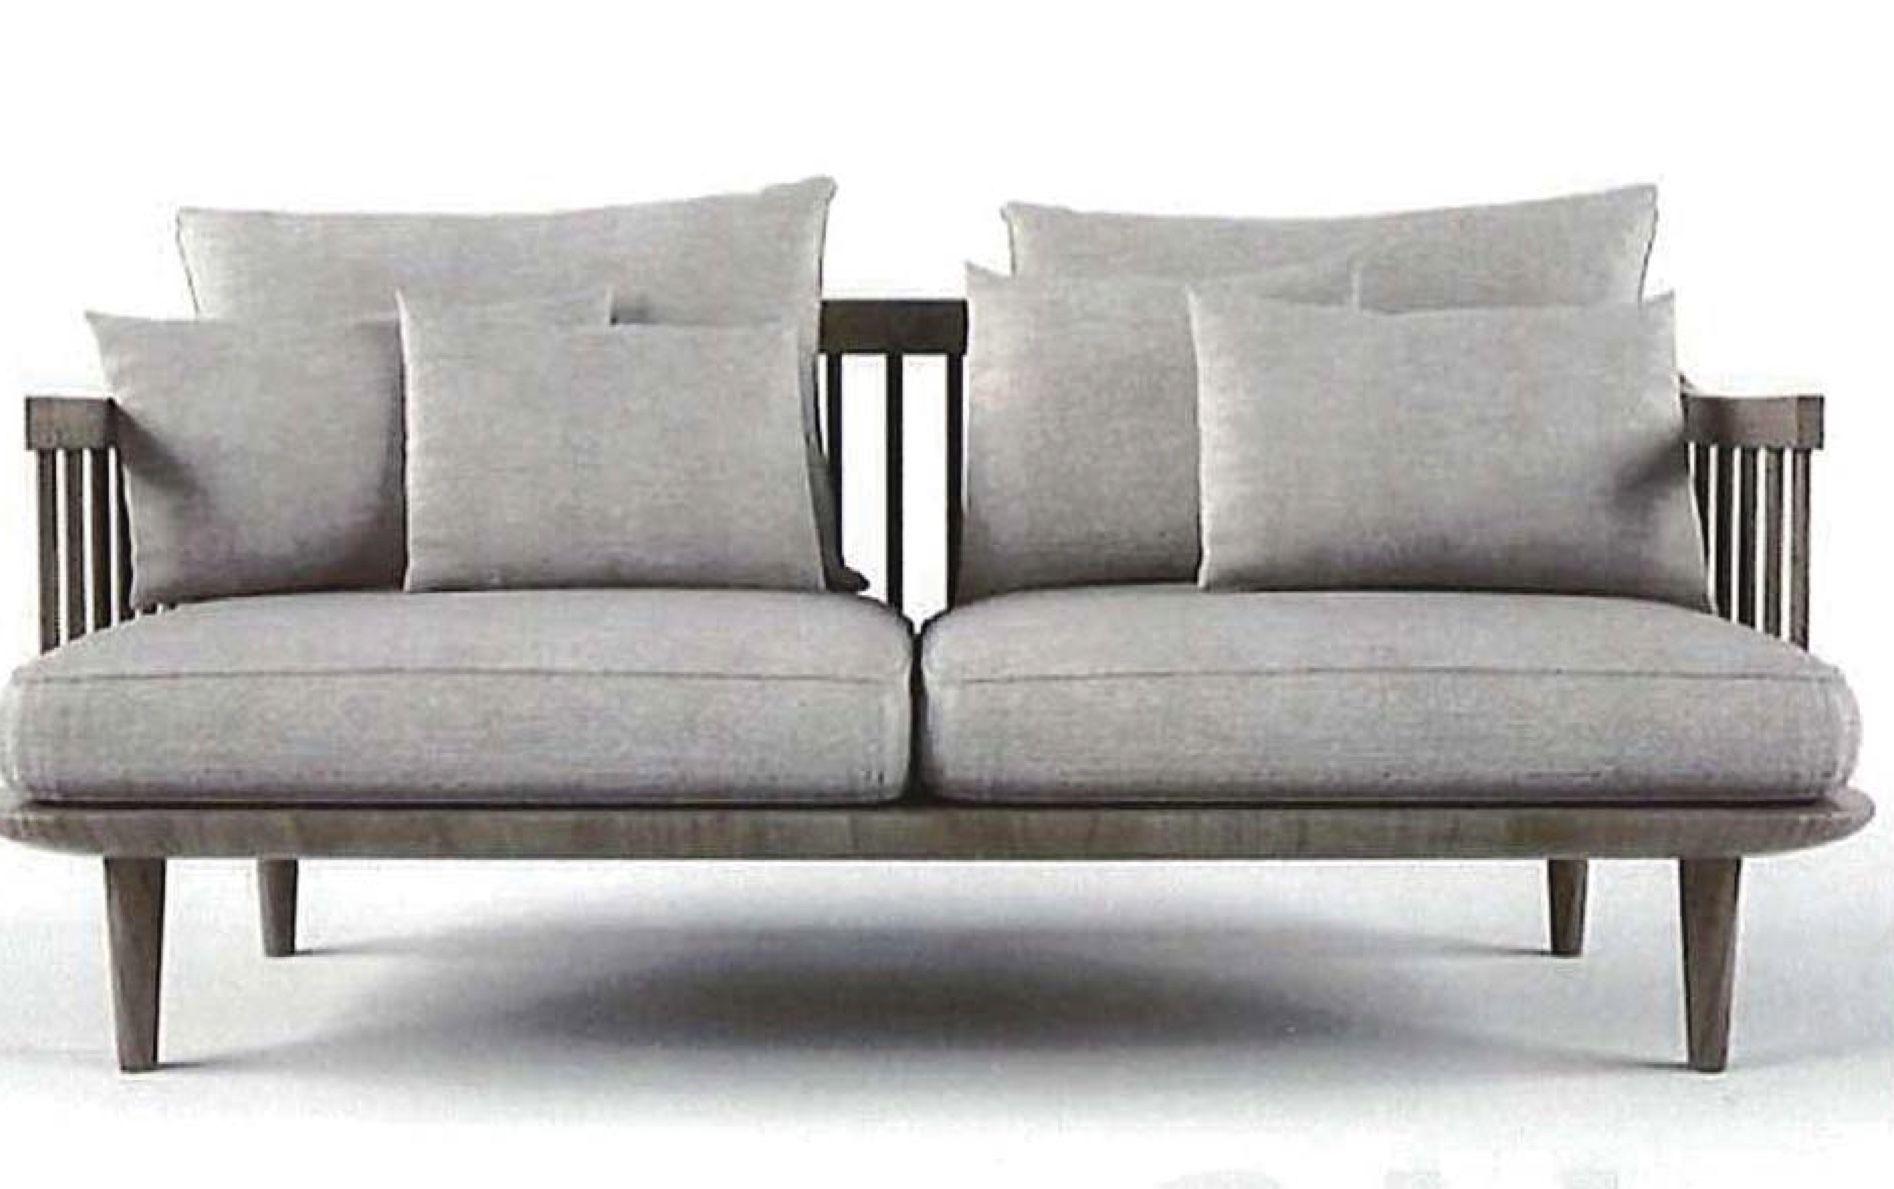 Pin By Indah Pranoto On Designer Furn Sofa Furniture Sofas And Chairs Furniture